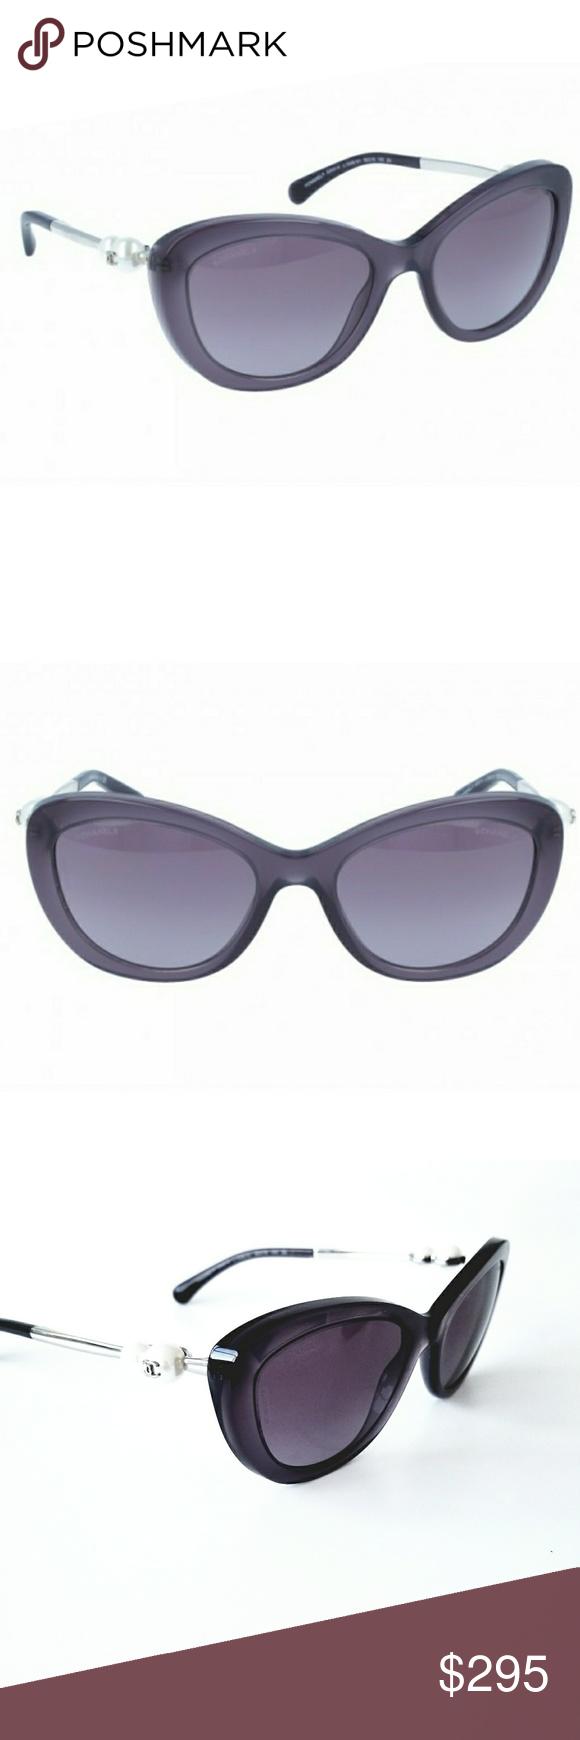 f113b5c2a1 Chanel 5340-H Cat Eye Pearl Purple Sunglasses Authentic Chanel Sunglasses  5340-H Cat